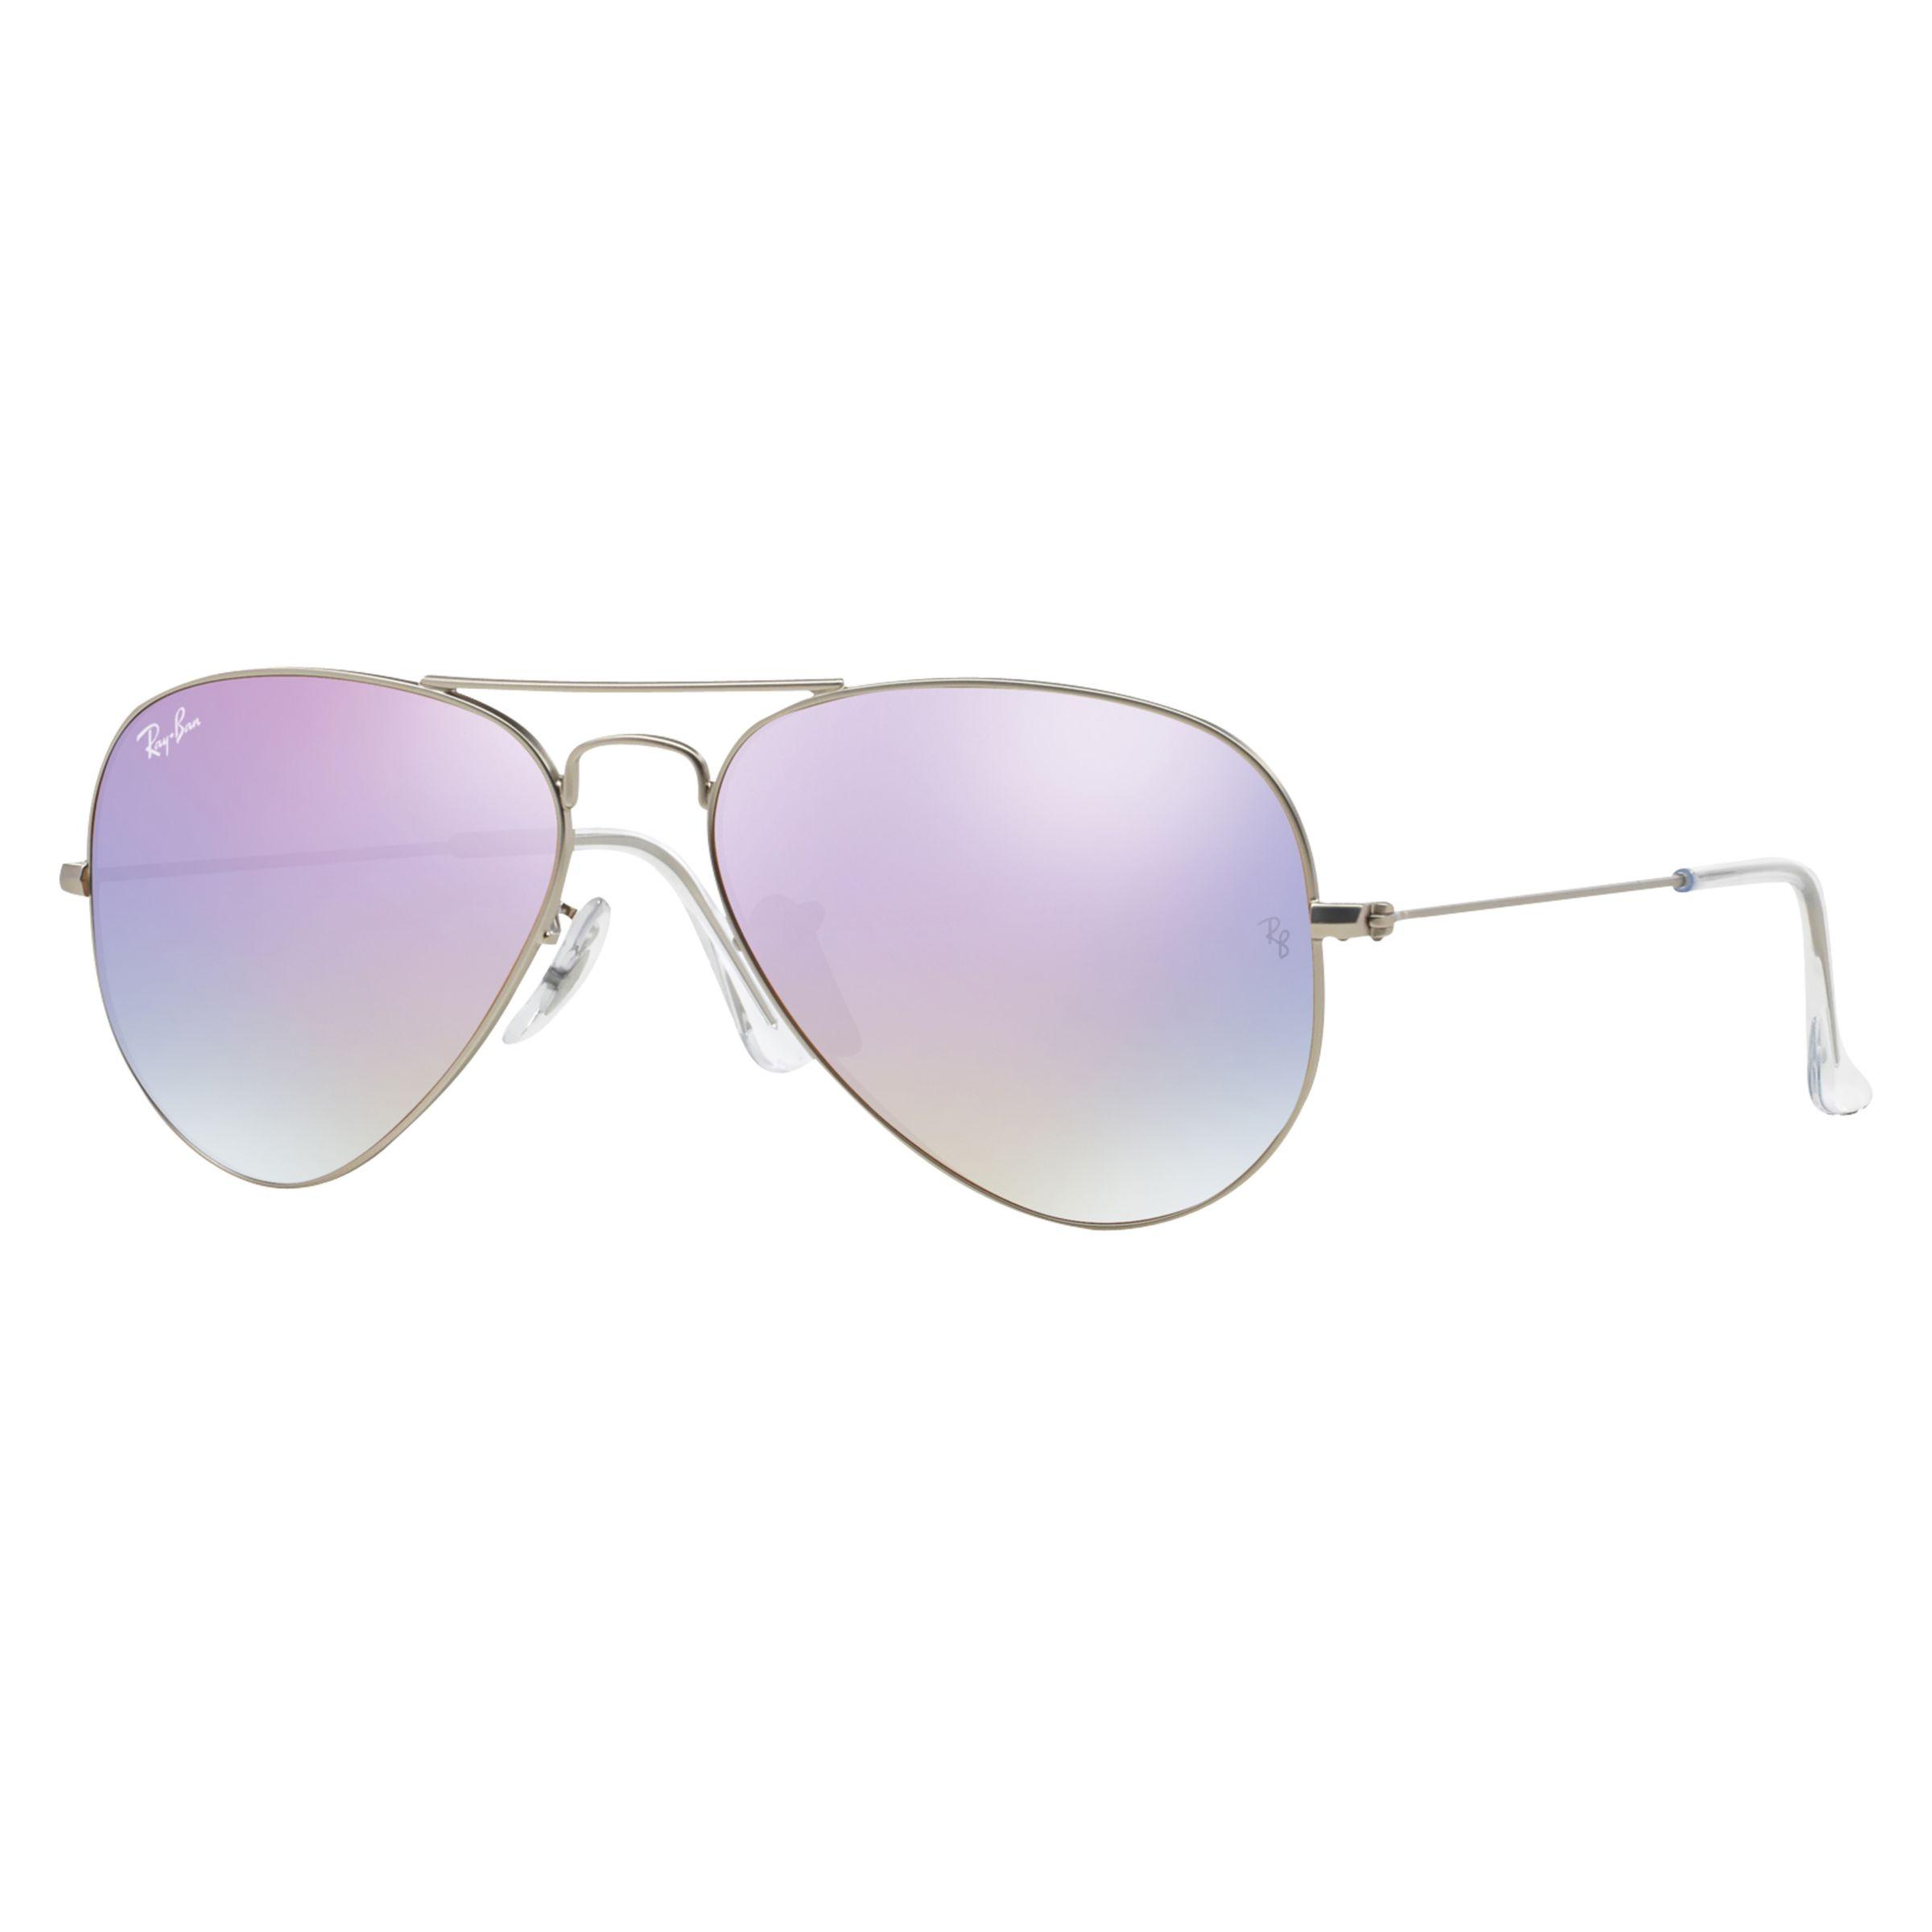 73ba11c153 Ray-Ban RB3025 Iconic Aviator Sunglasses at John Lewis & Partners